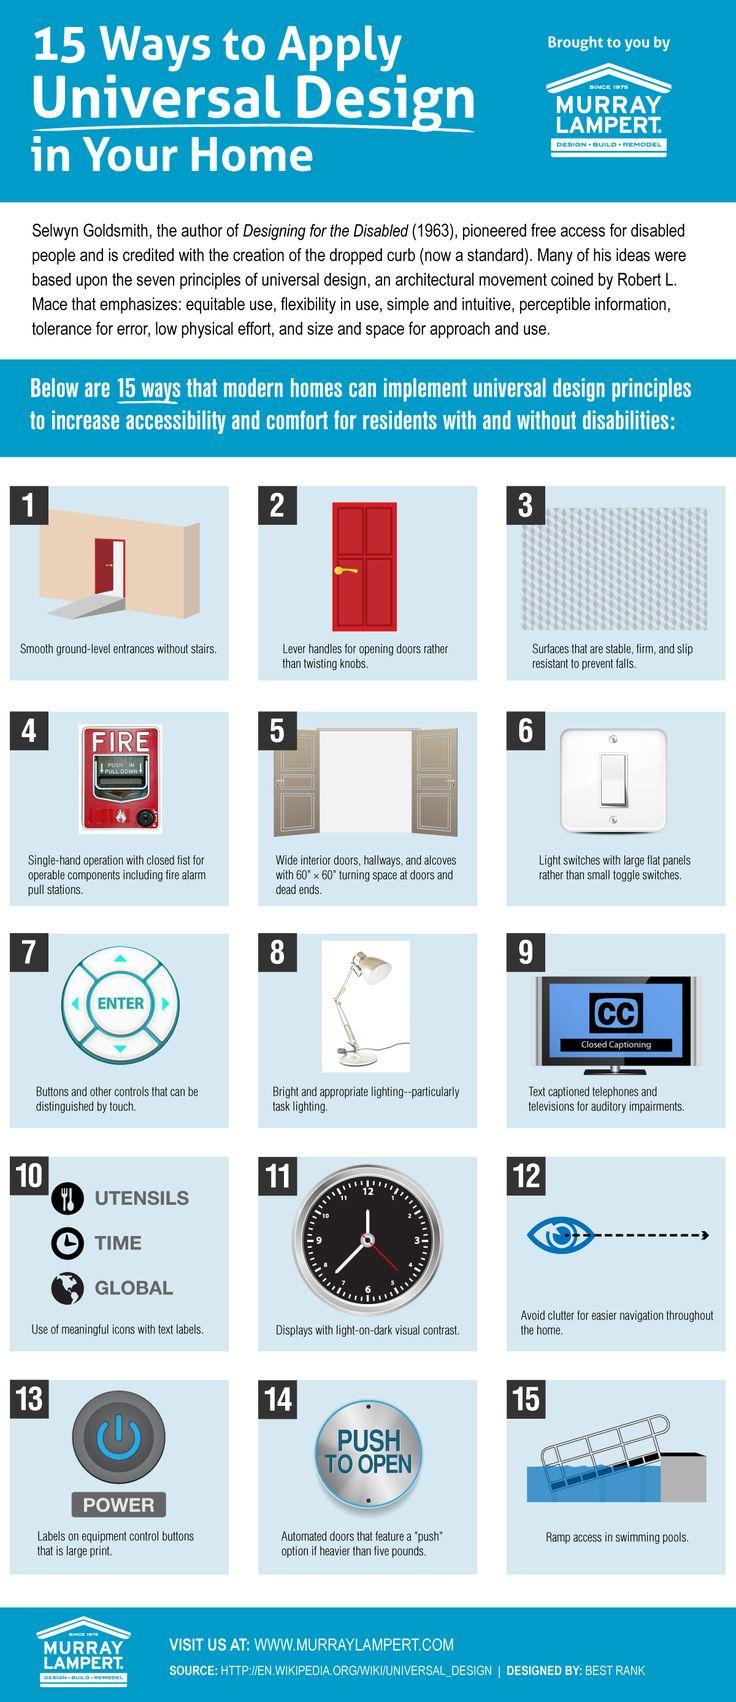 how to make elderly feel useful